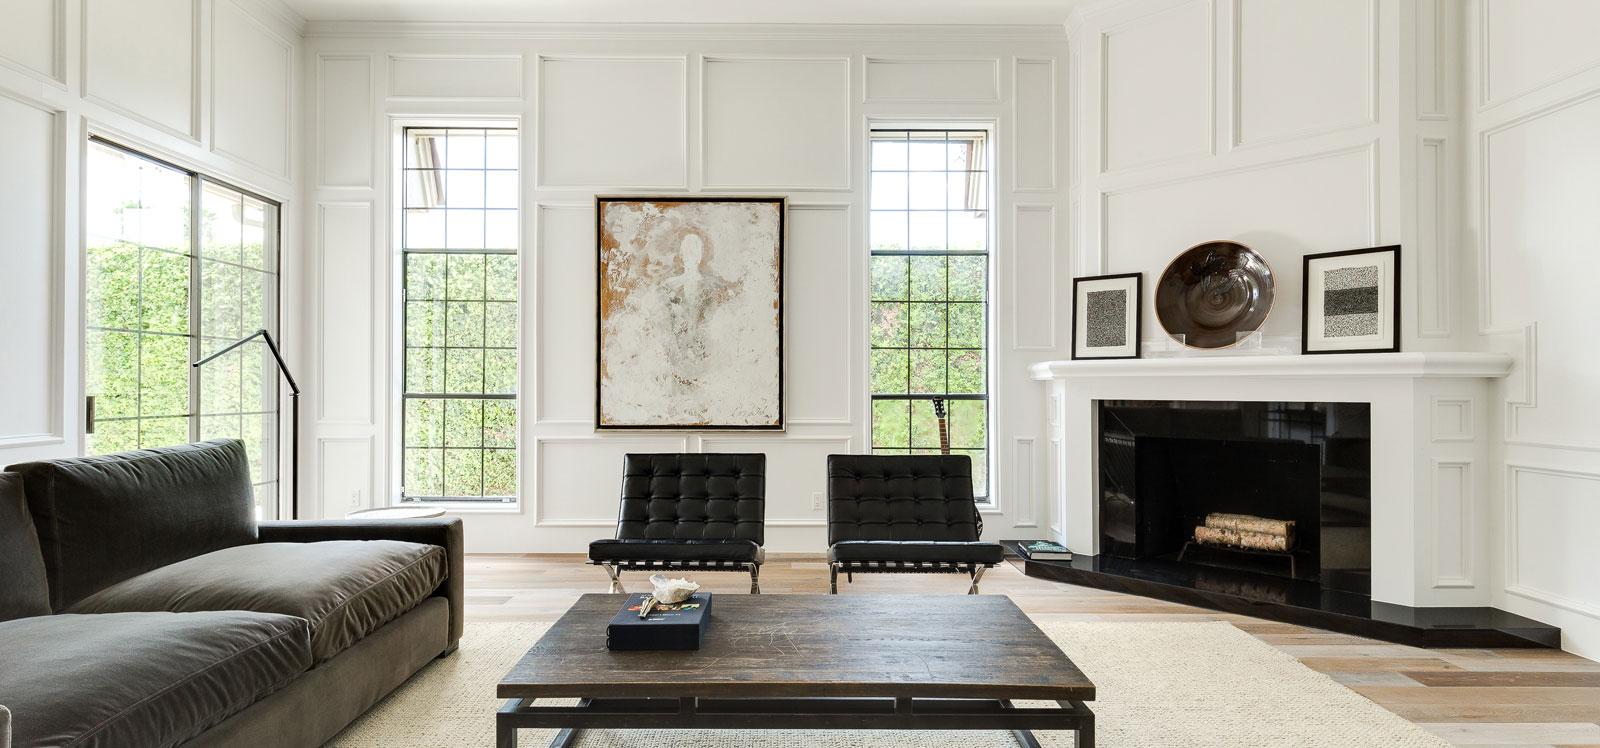 Blackand White Theme of Living Room